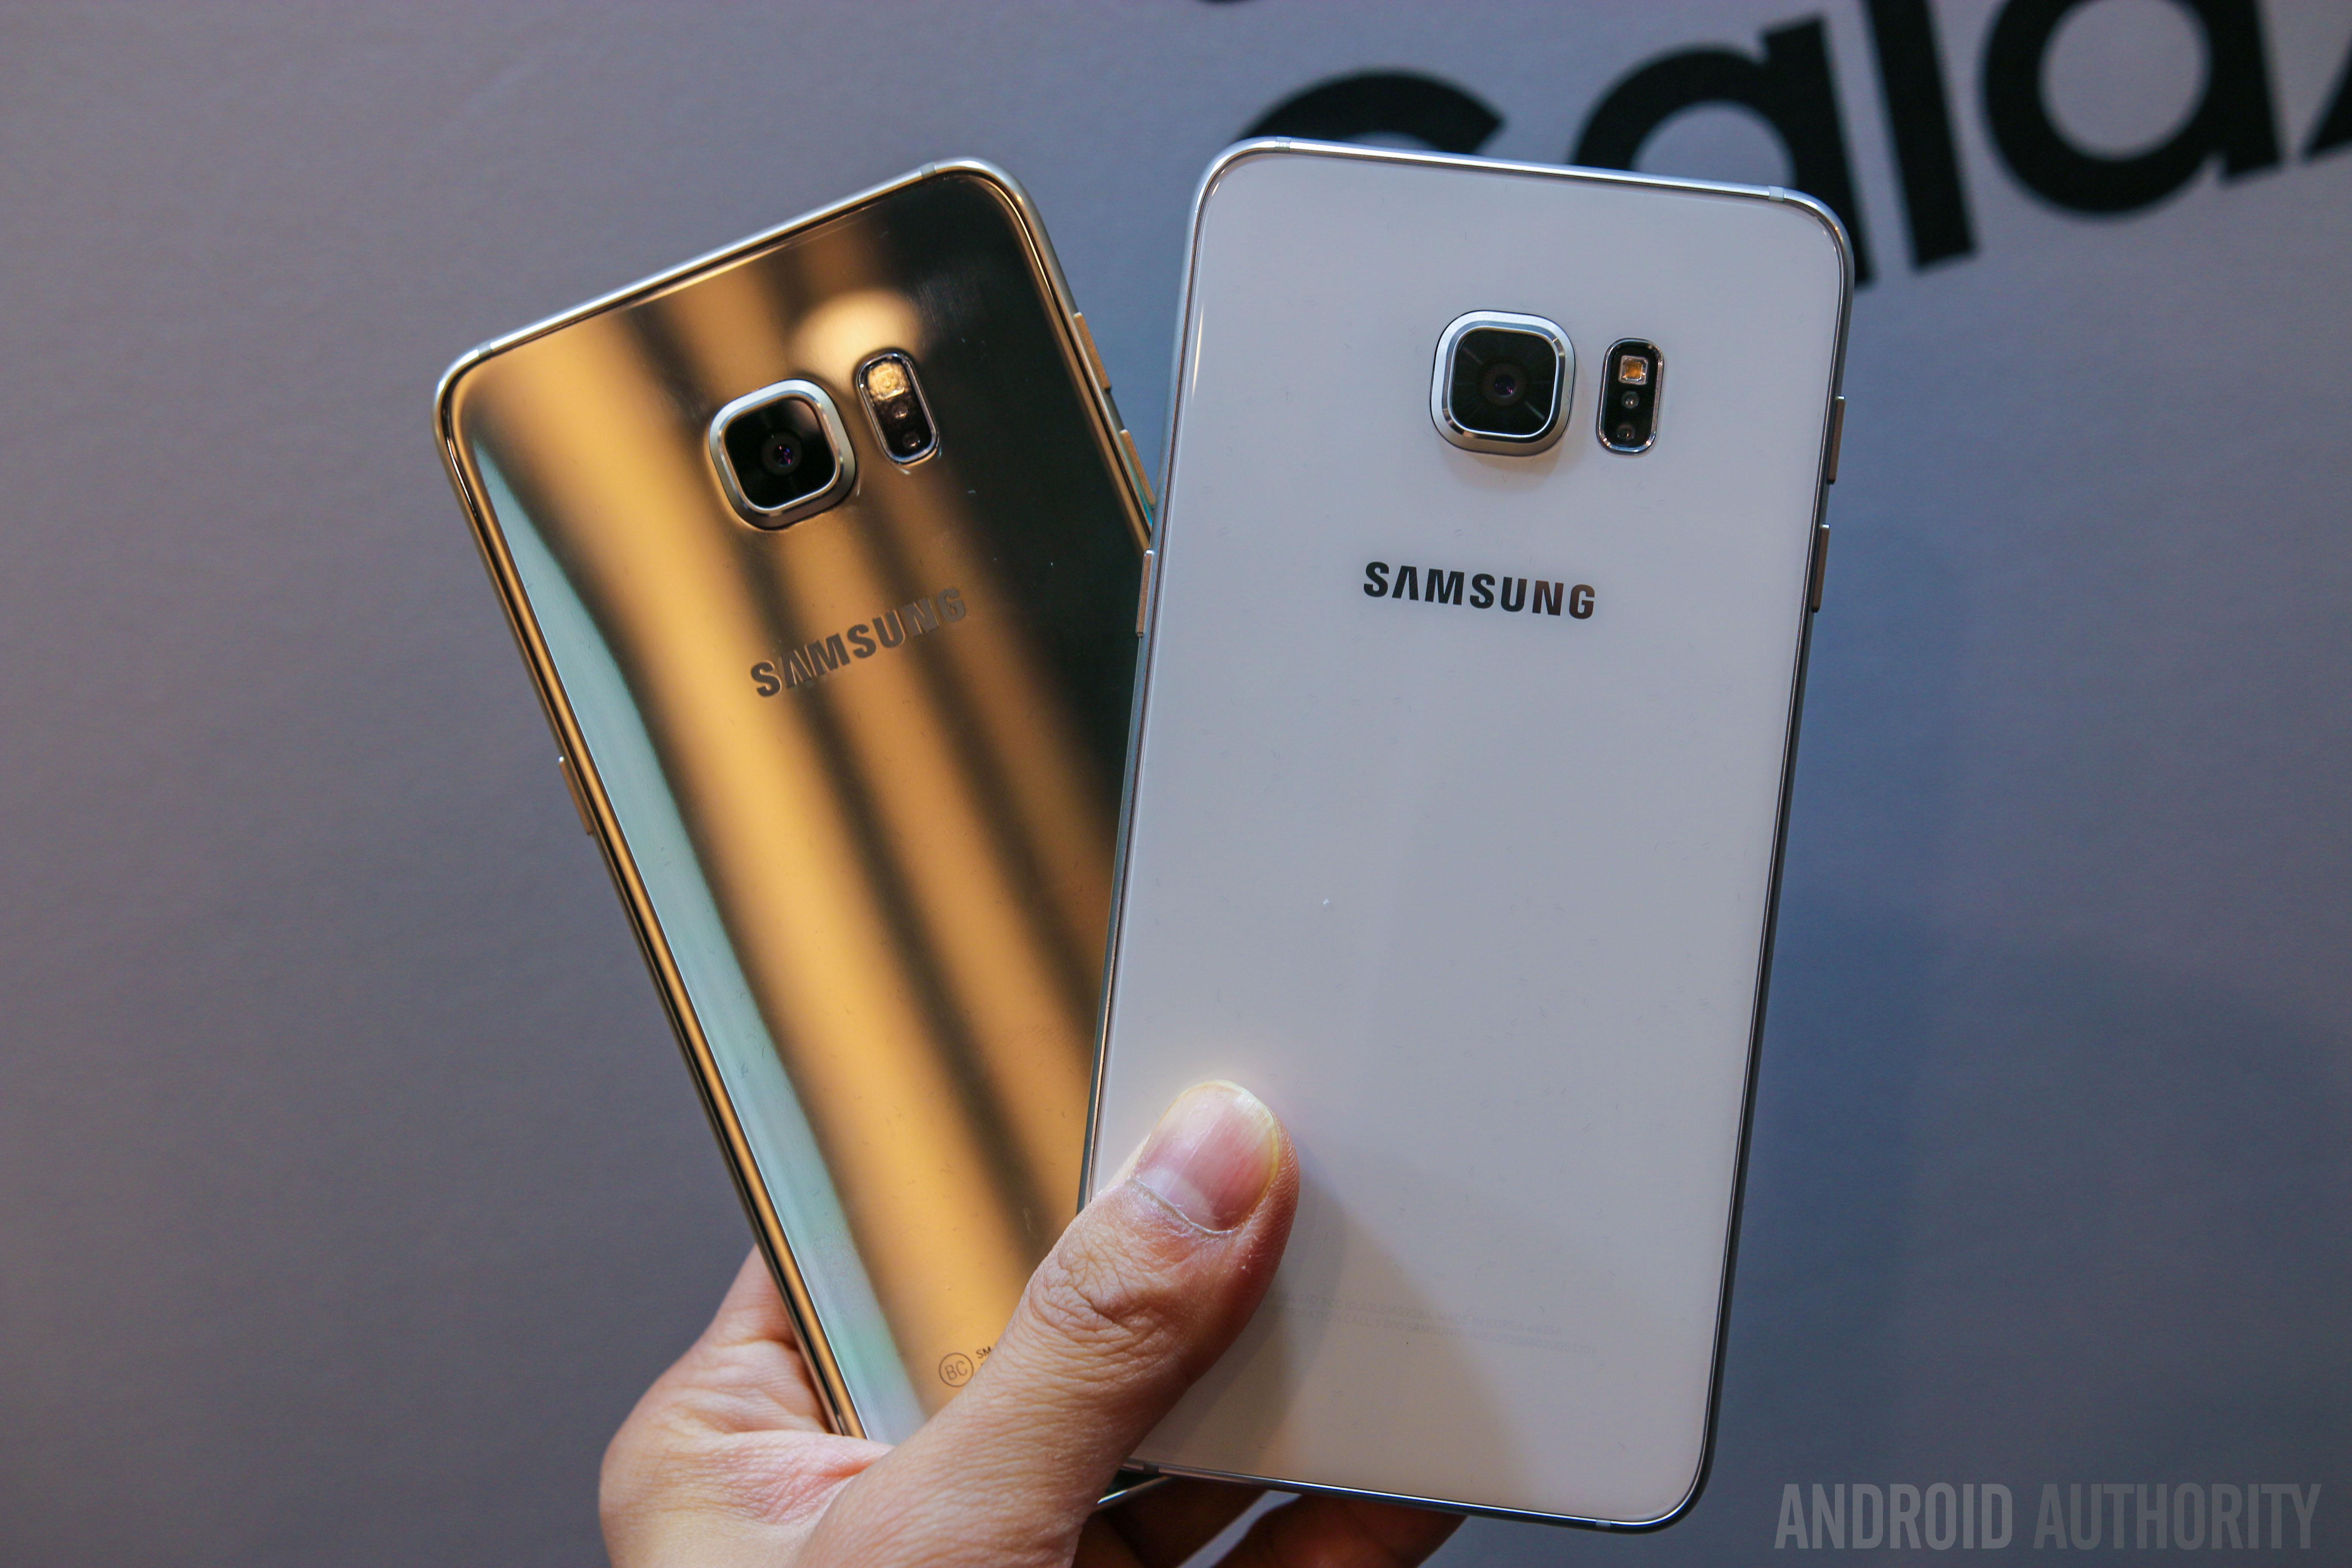 Samsung Galaxy S6 Edge Plus Hands On-27